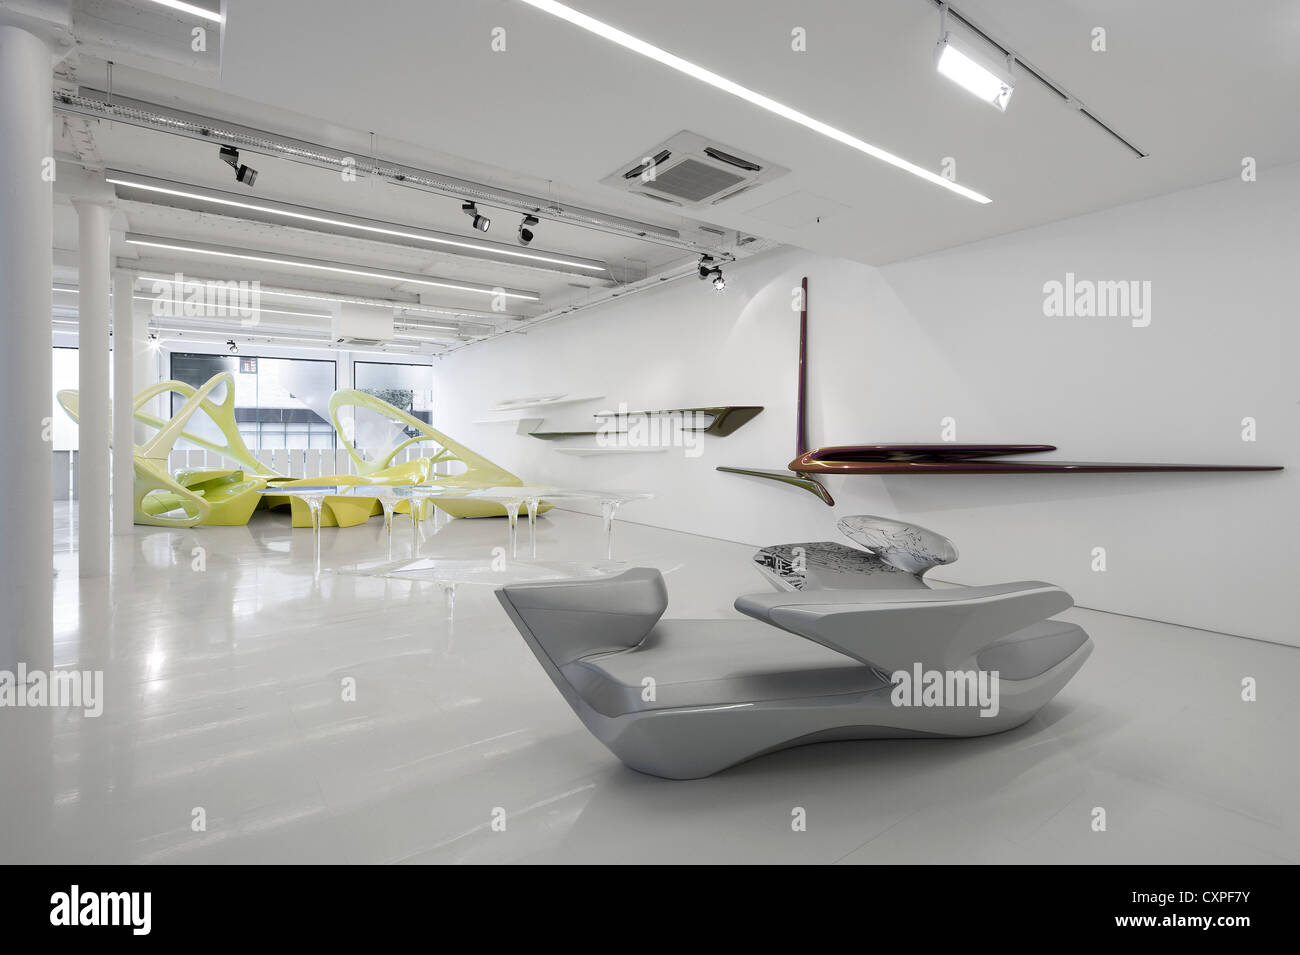 Zaha Hadid Design Gallery With Fudge Hair Pop Up Salon London Stock